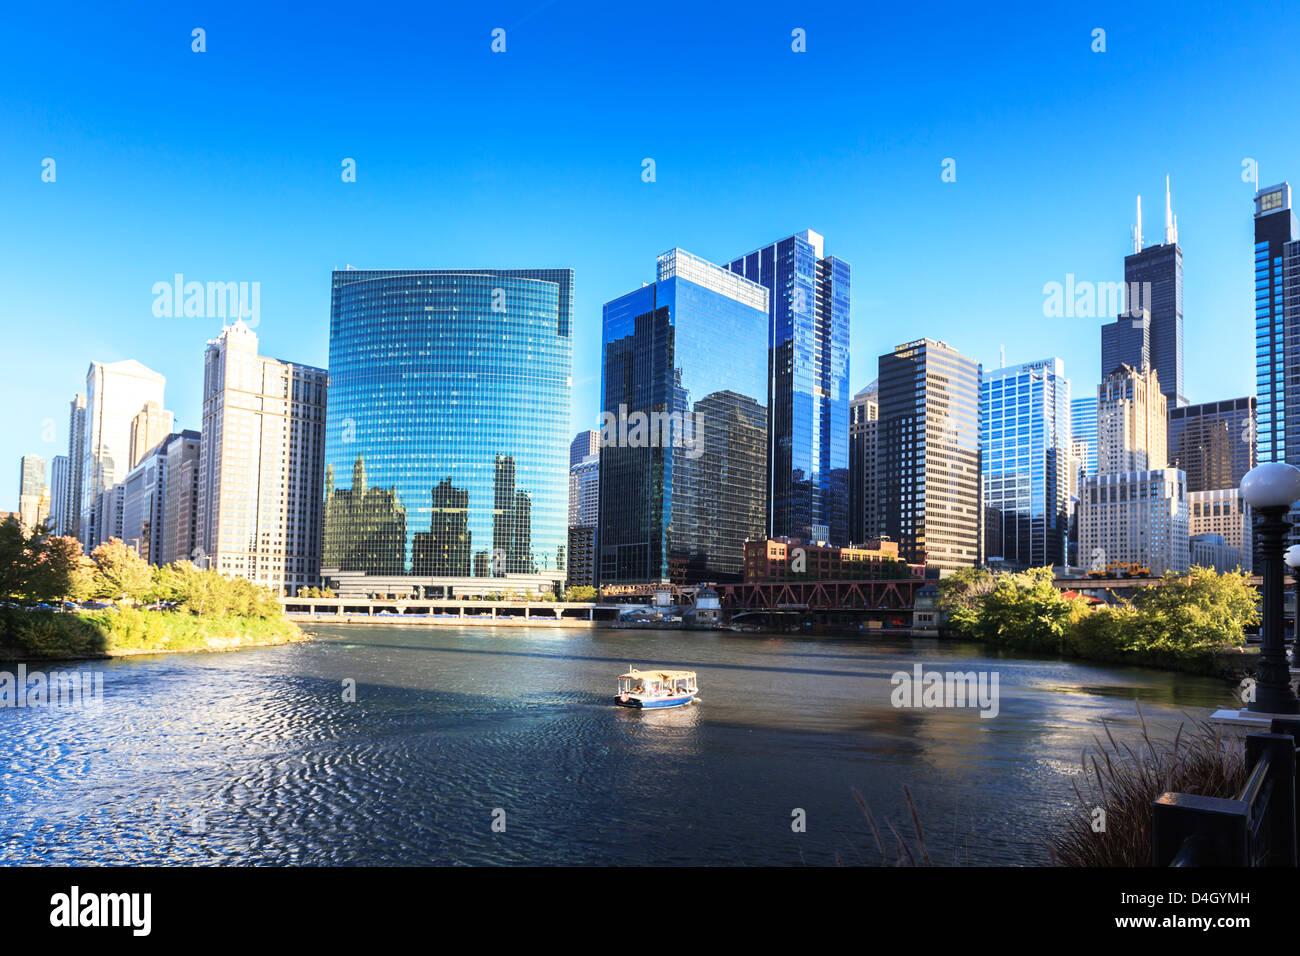 Wolkenkratzer folgen Sie der Kurve des Flusses Chicago, Chicago, Illinois, USA Stockbild